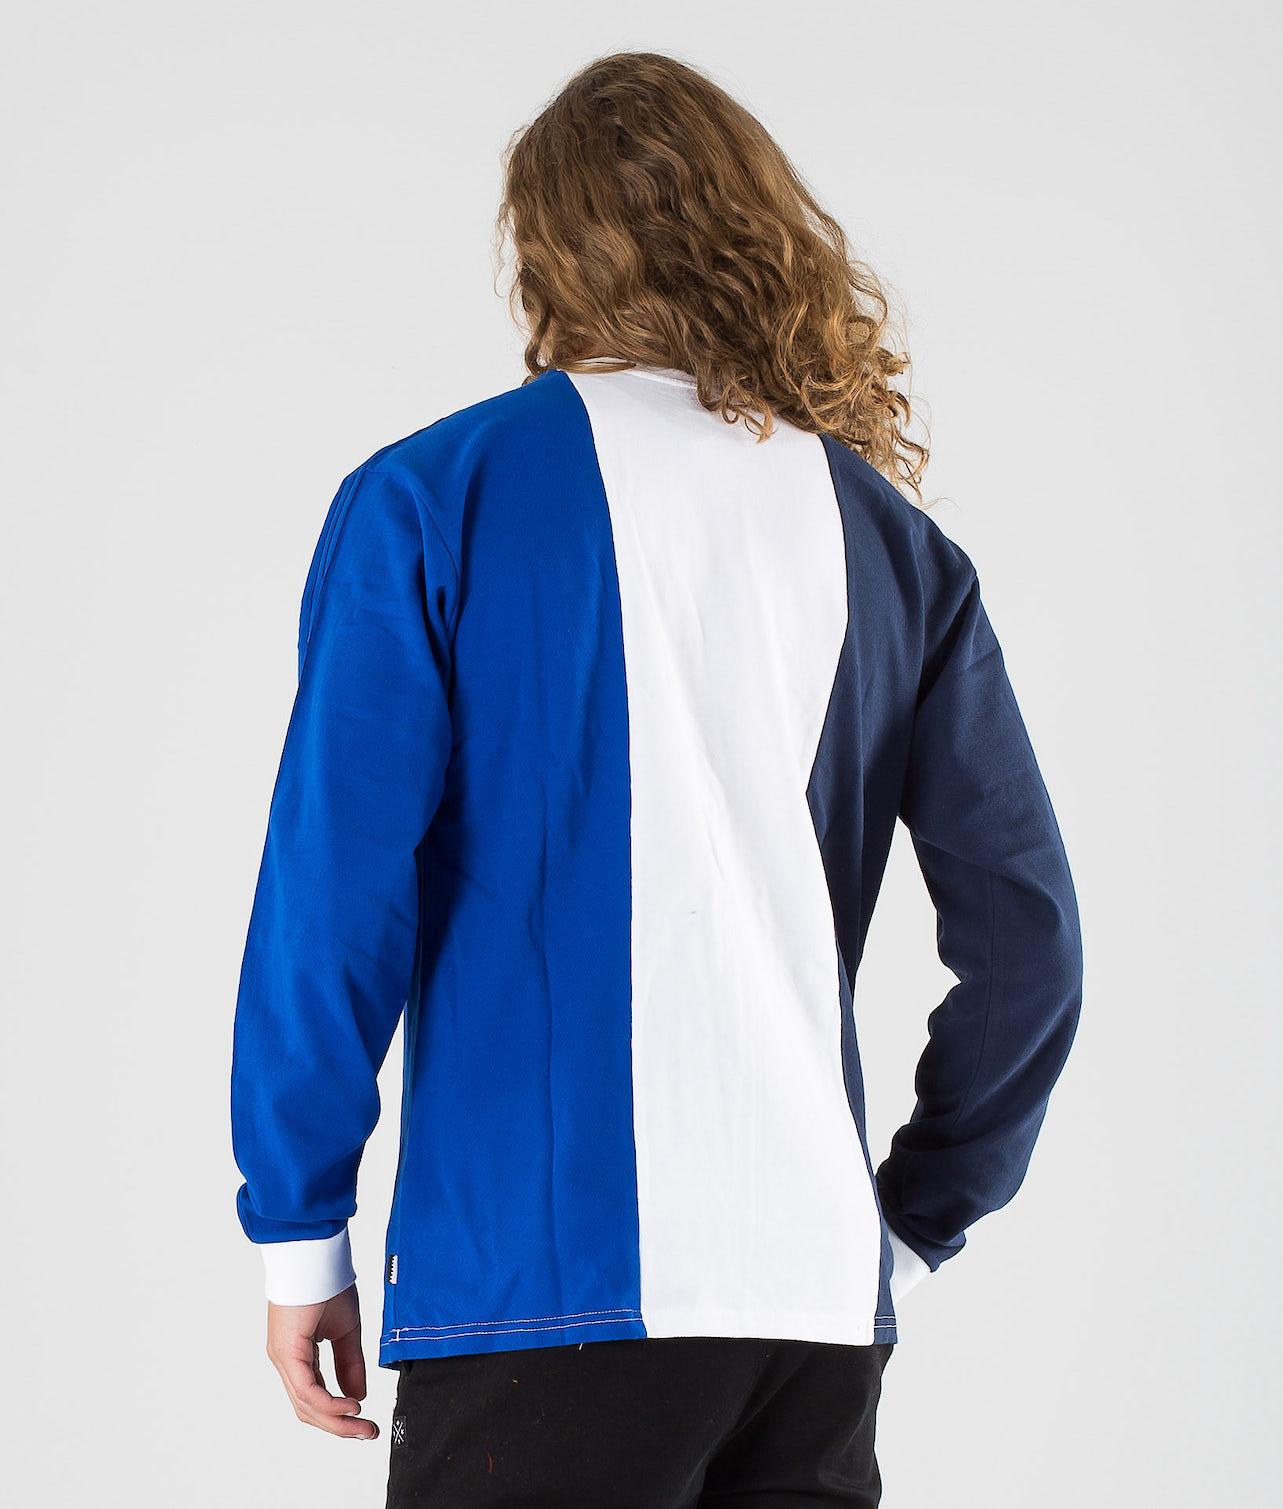 Adidas Skateboarding Tripart Tee T-shirt Collegiate Navy/White/Collegiate Royal